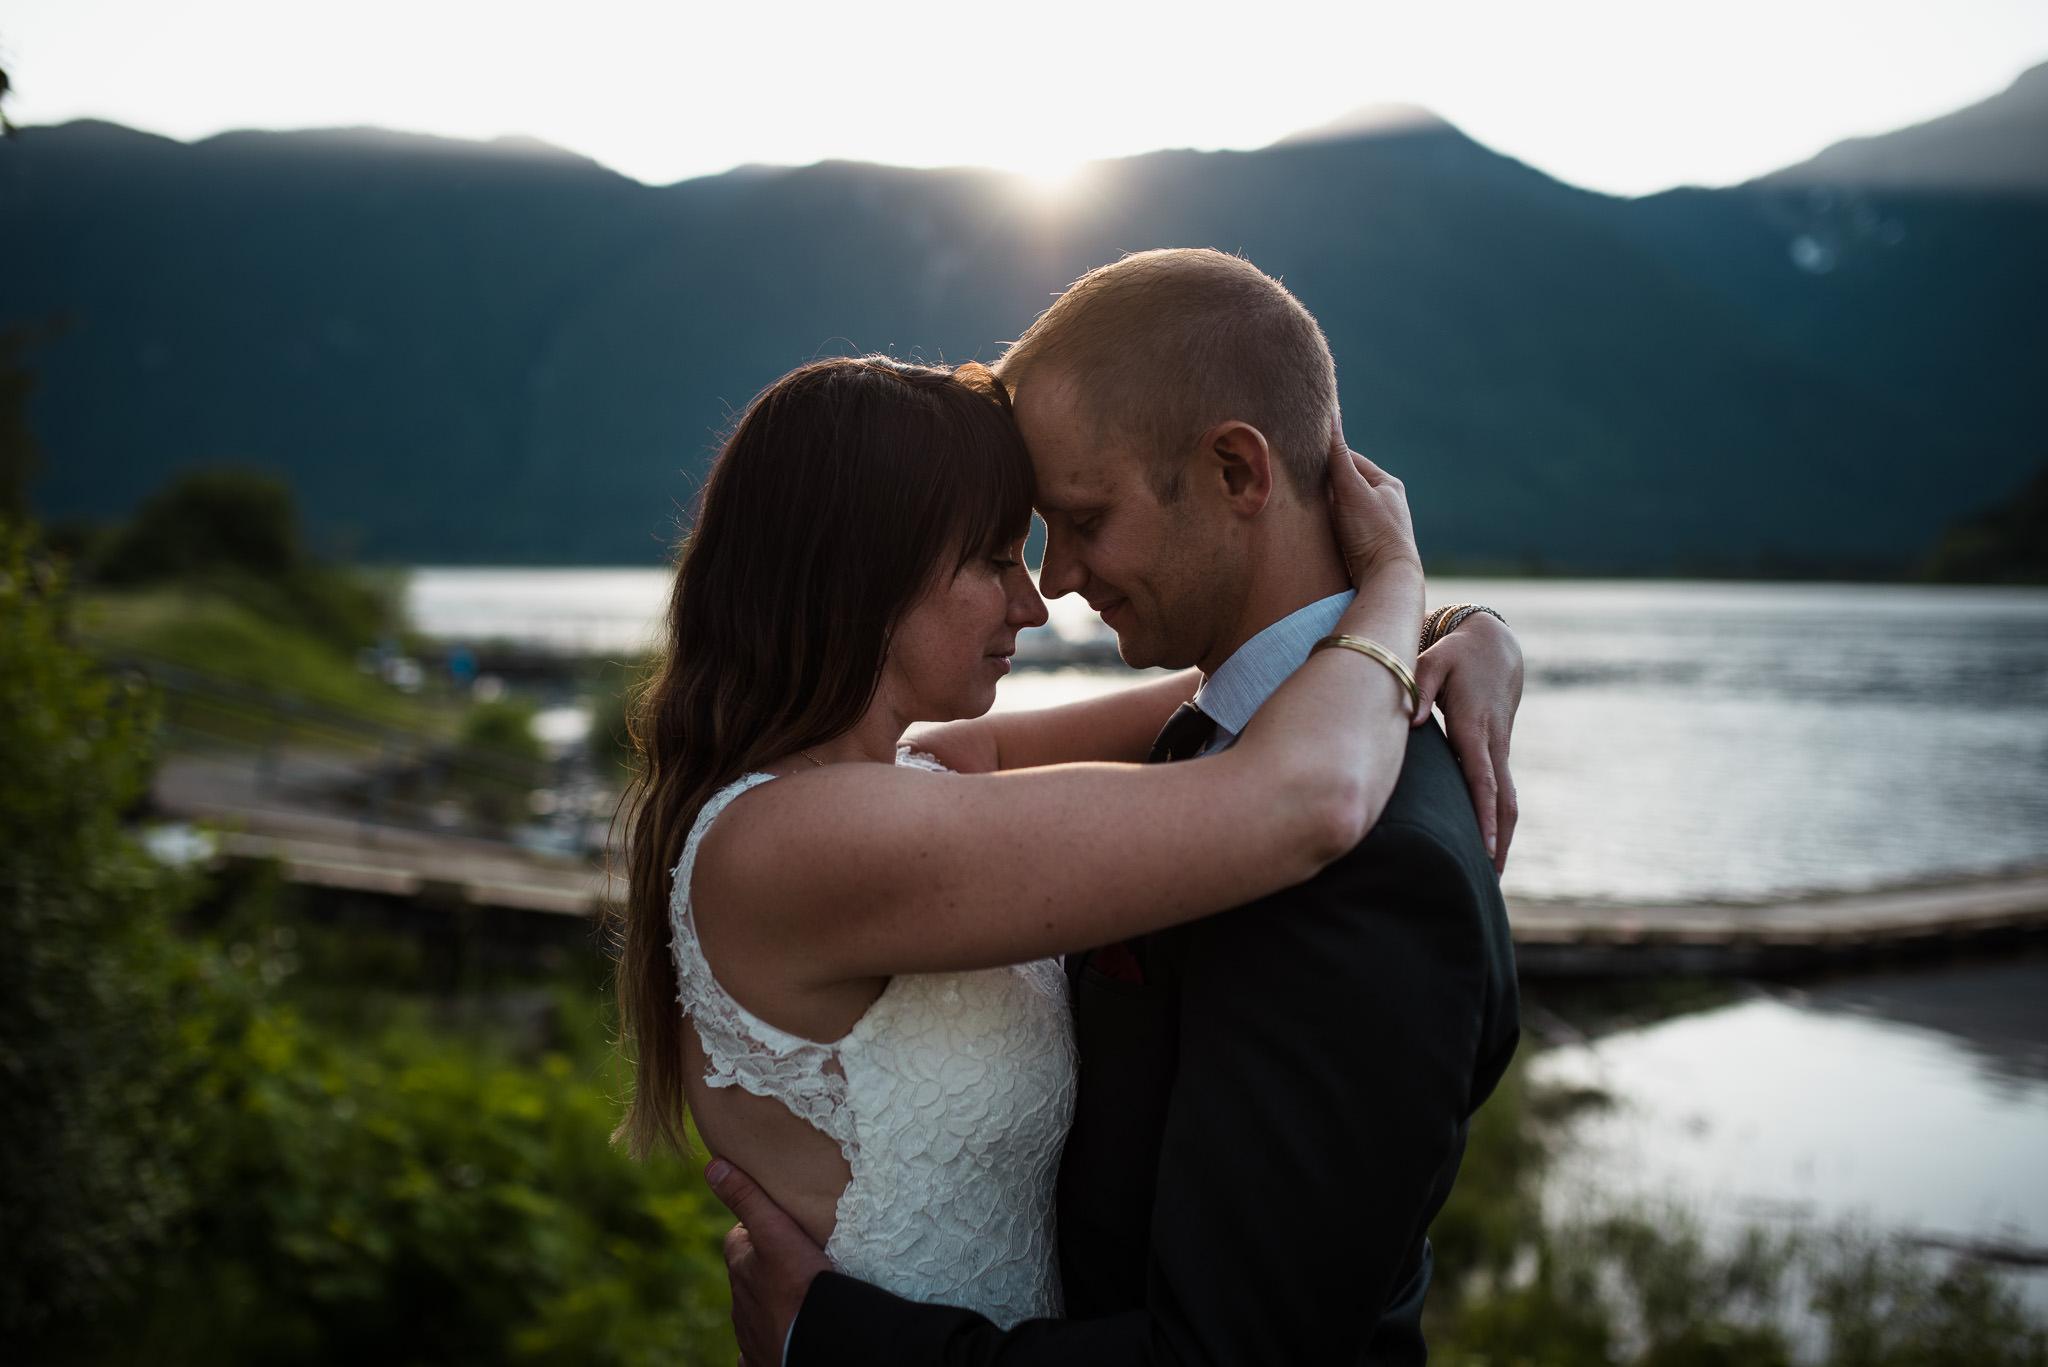 Melanie-Matt-Pitt-Lake-Post-Wedding-Shoot-Victoria-Wedding-Photographers-20.jpg